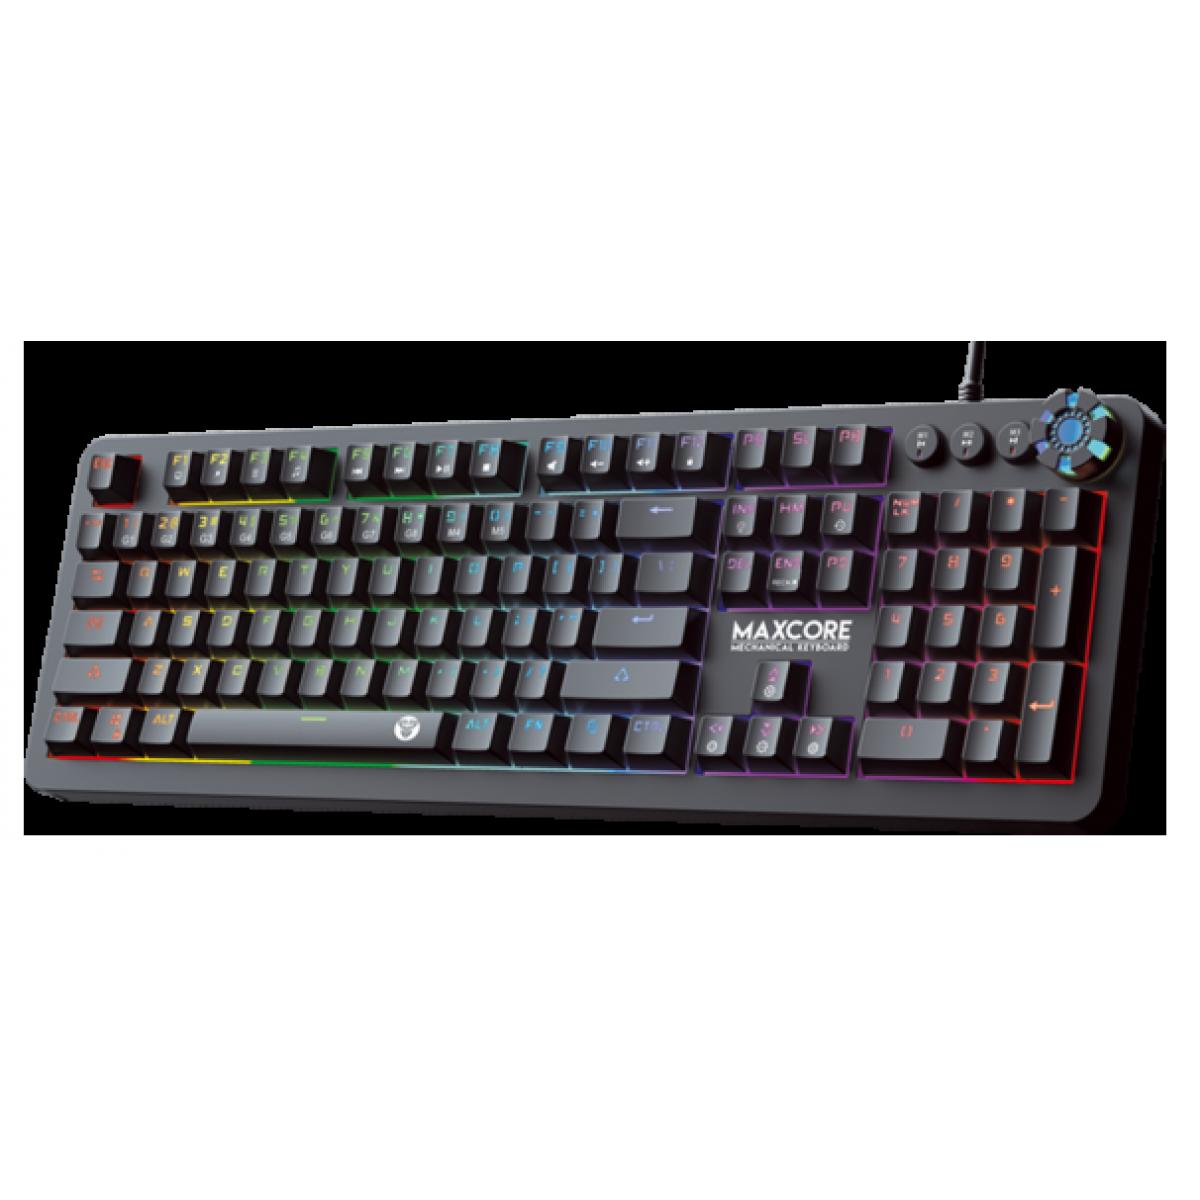 Teclado Gamer Mecânico Fantech Max Core, RGB, Switch Blue, Black, MK852